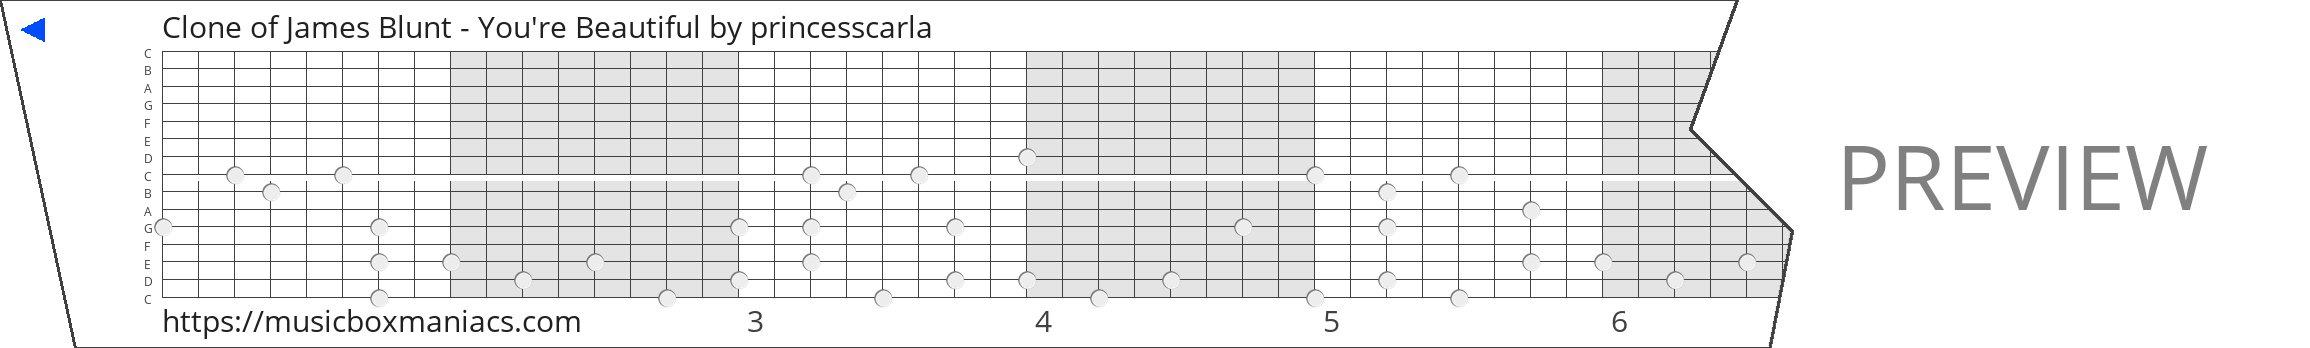 Clone of James Blunt - You're Beautiful 15 note music box paper strip